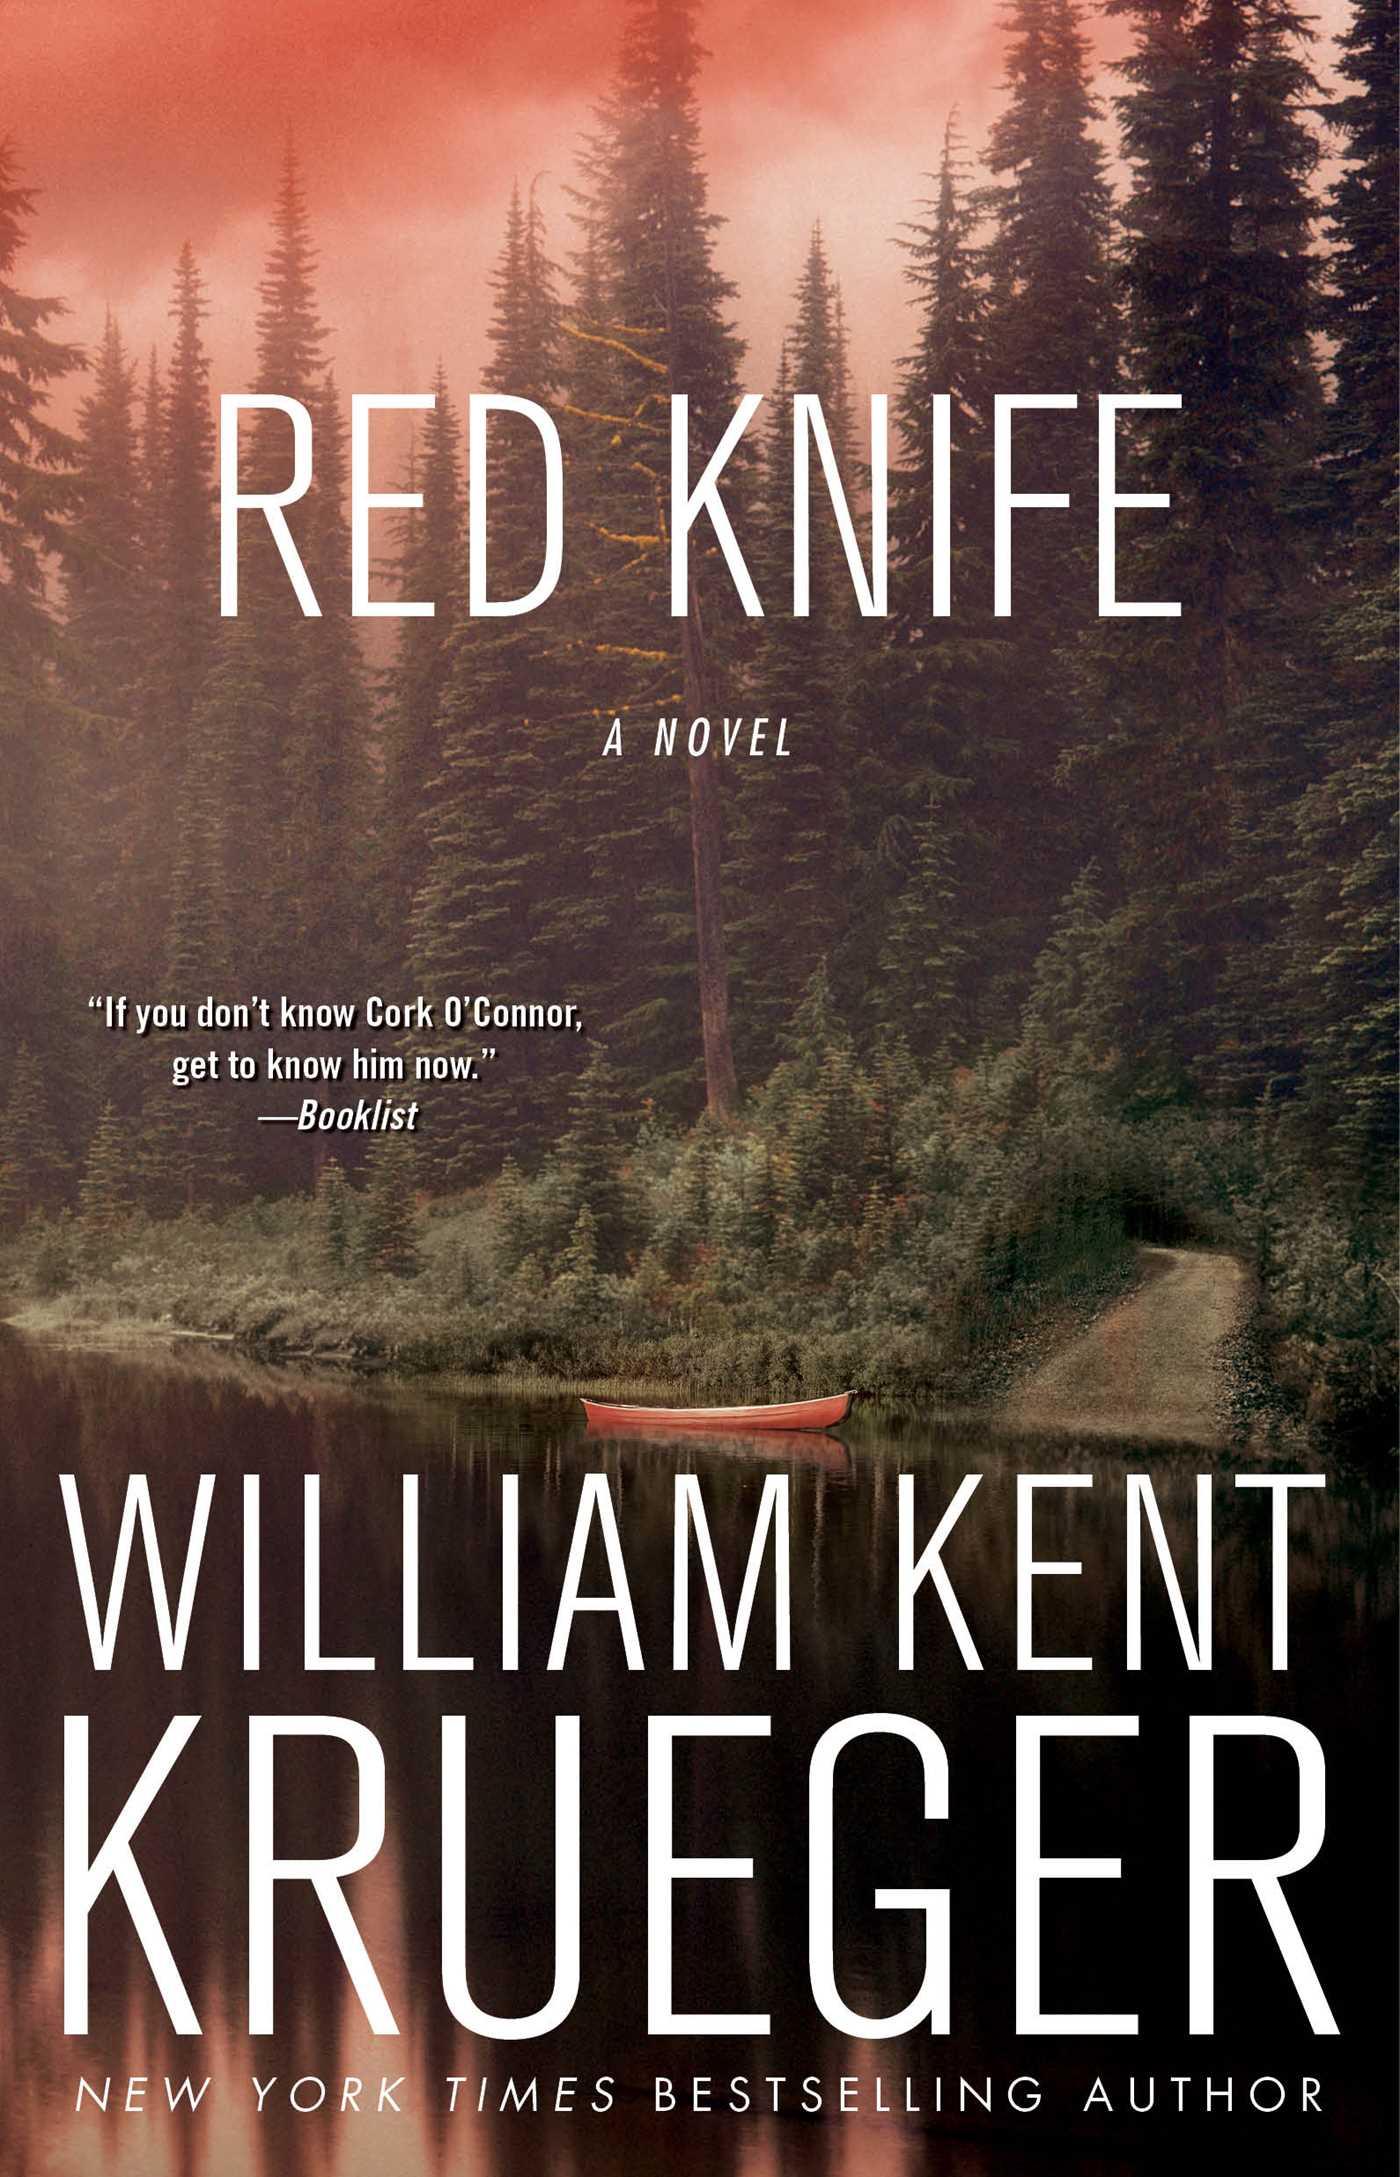 Red knife 9781416580218 hr